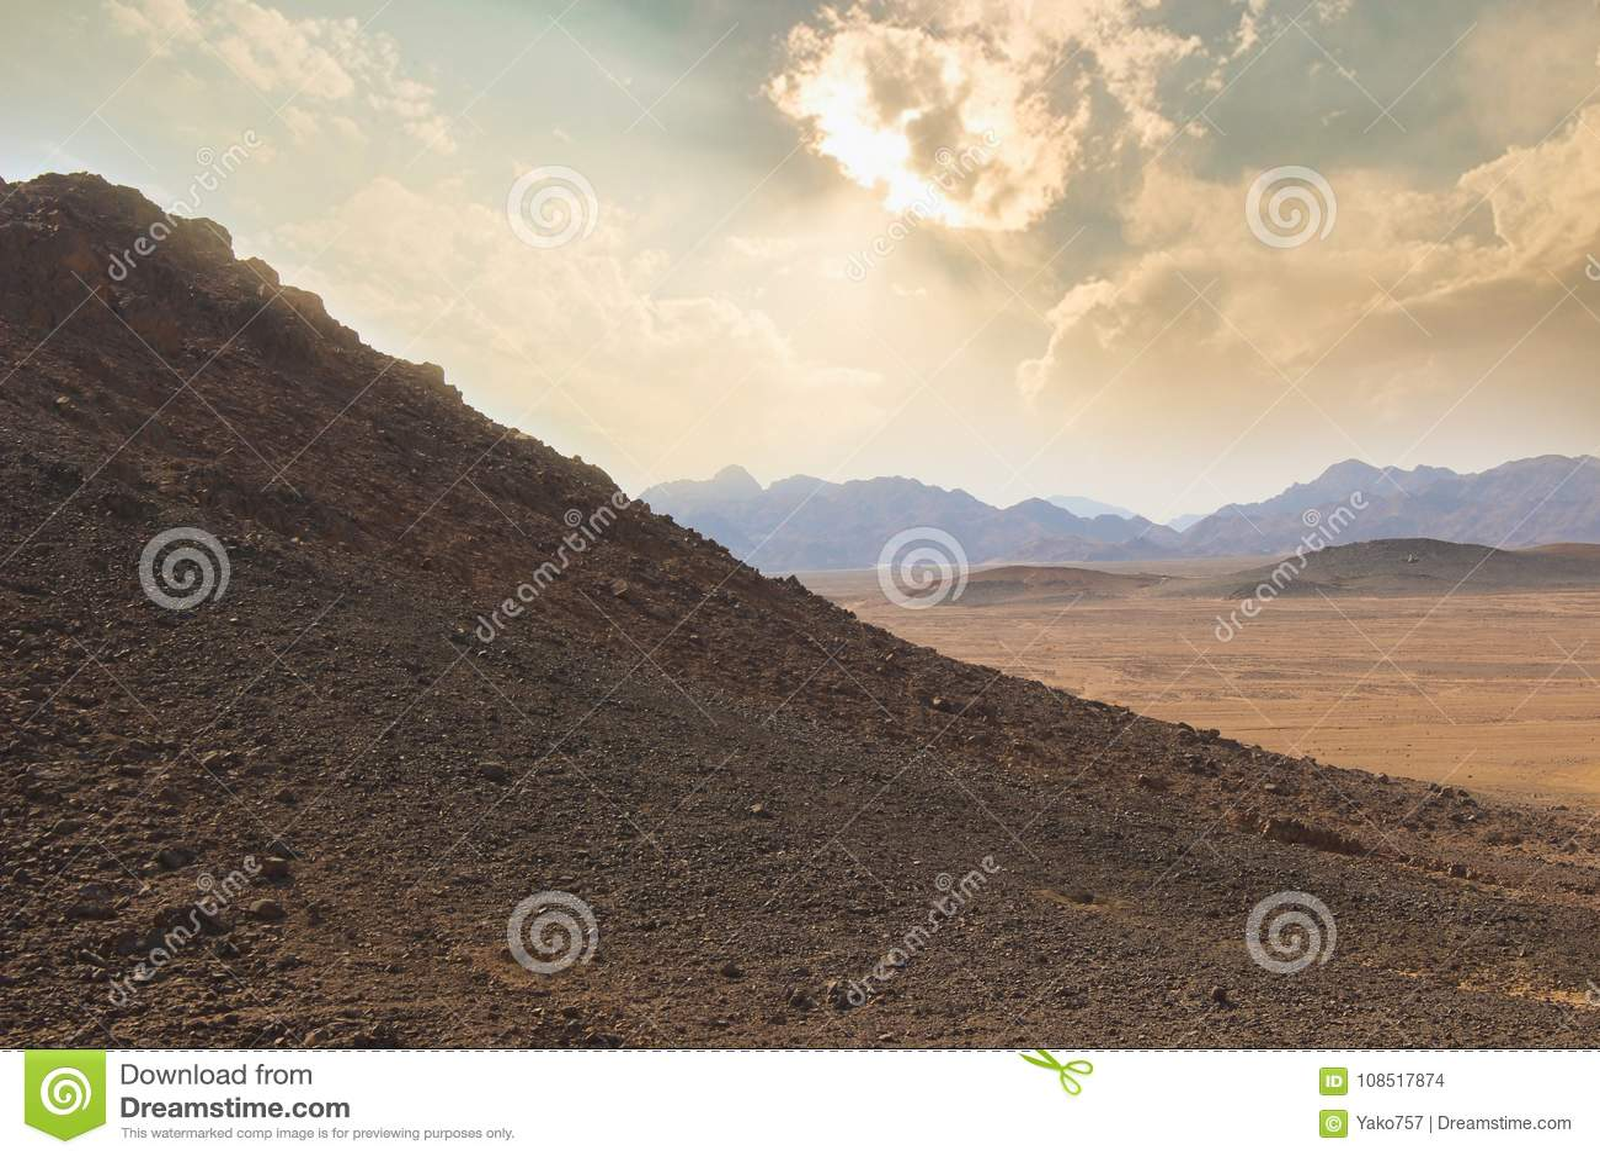 Desert with amazing sky in Egypt.